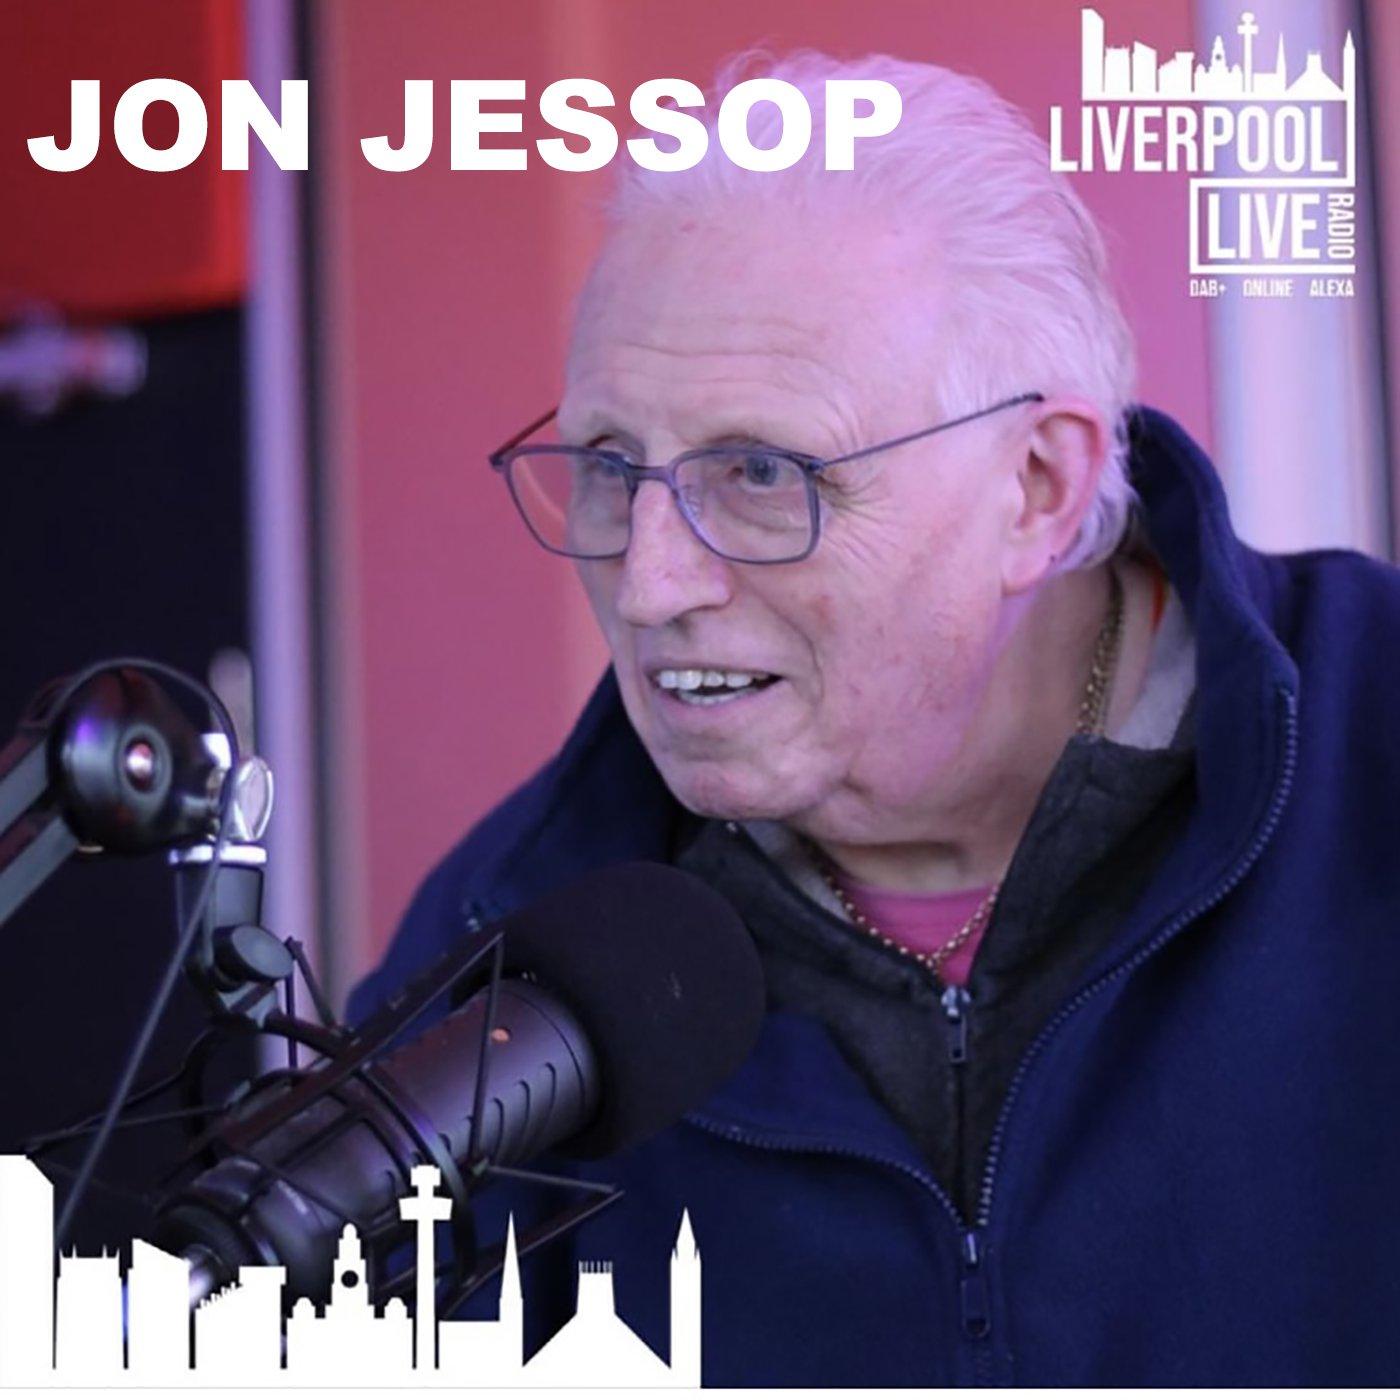 Jon Jessop